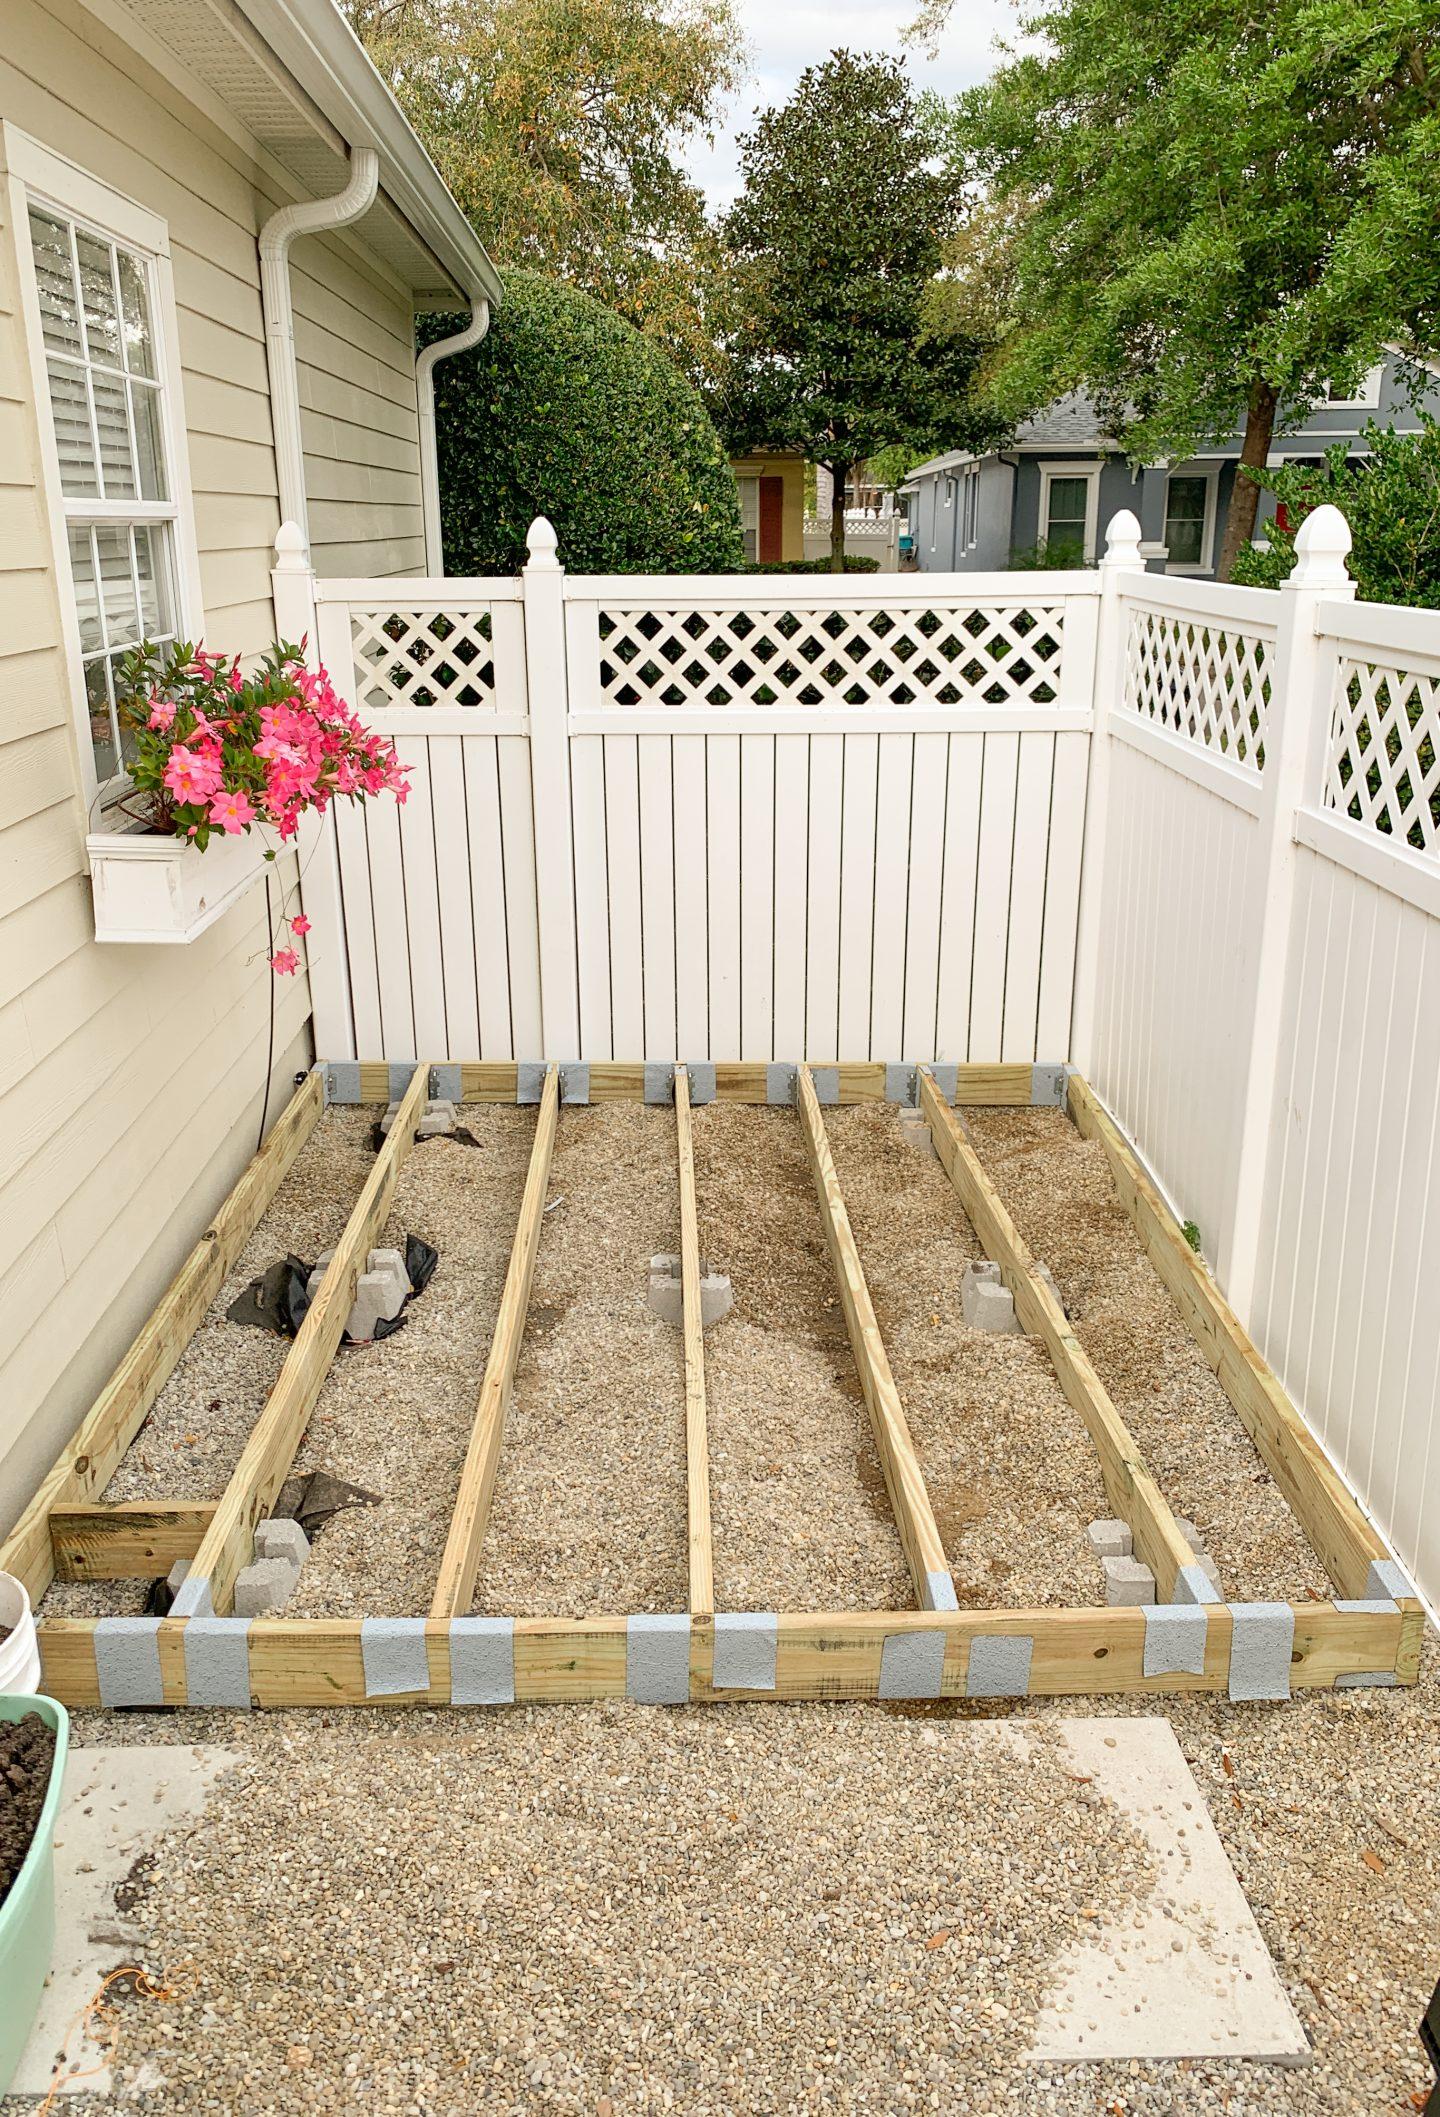 Wood Deck frame and deck blocks - DIY wood deck